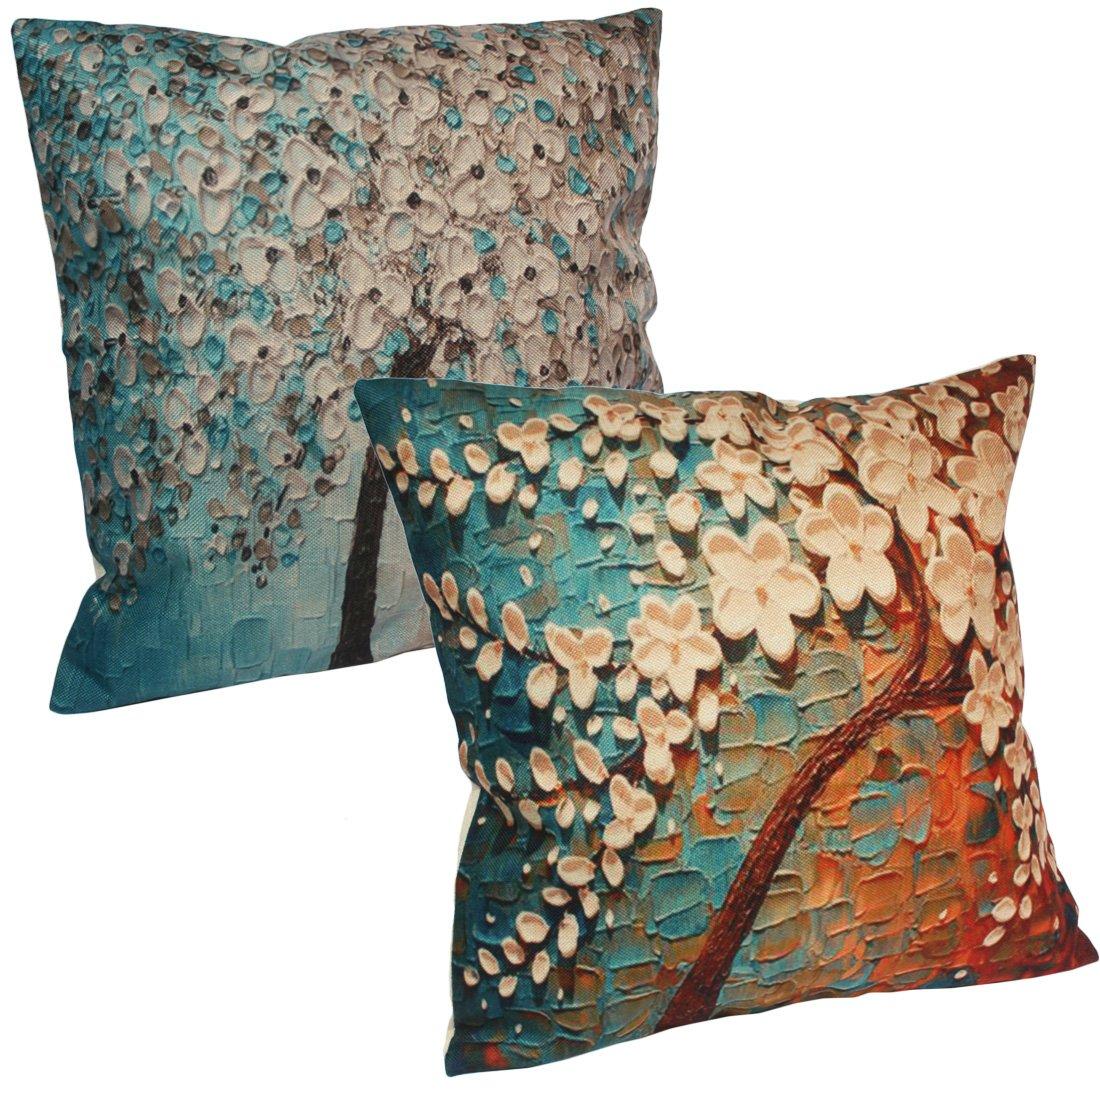 kilofly Home Decorative 3D Print Throw Pillow Cover Case, 18 x 18 [Set of 2] TRTAZ11A